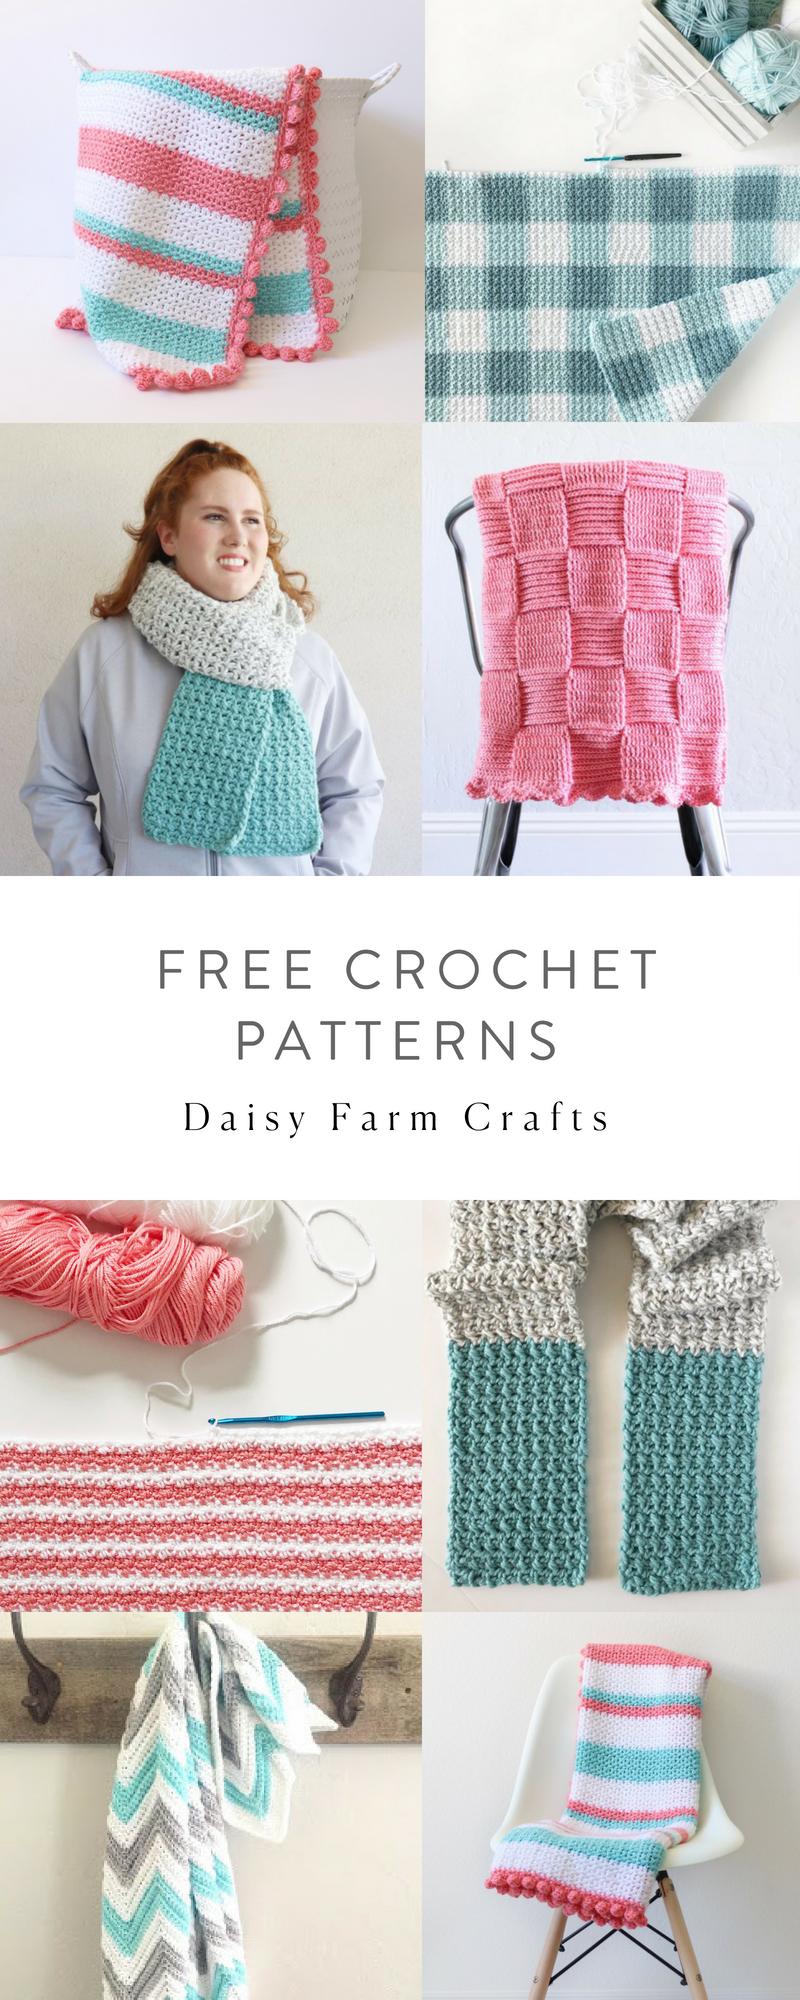 Free Crochet Patterns - Daisy Farm Crafts | tejidos | Pinterest ...